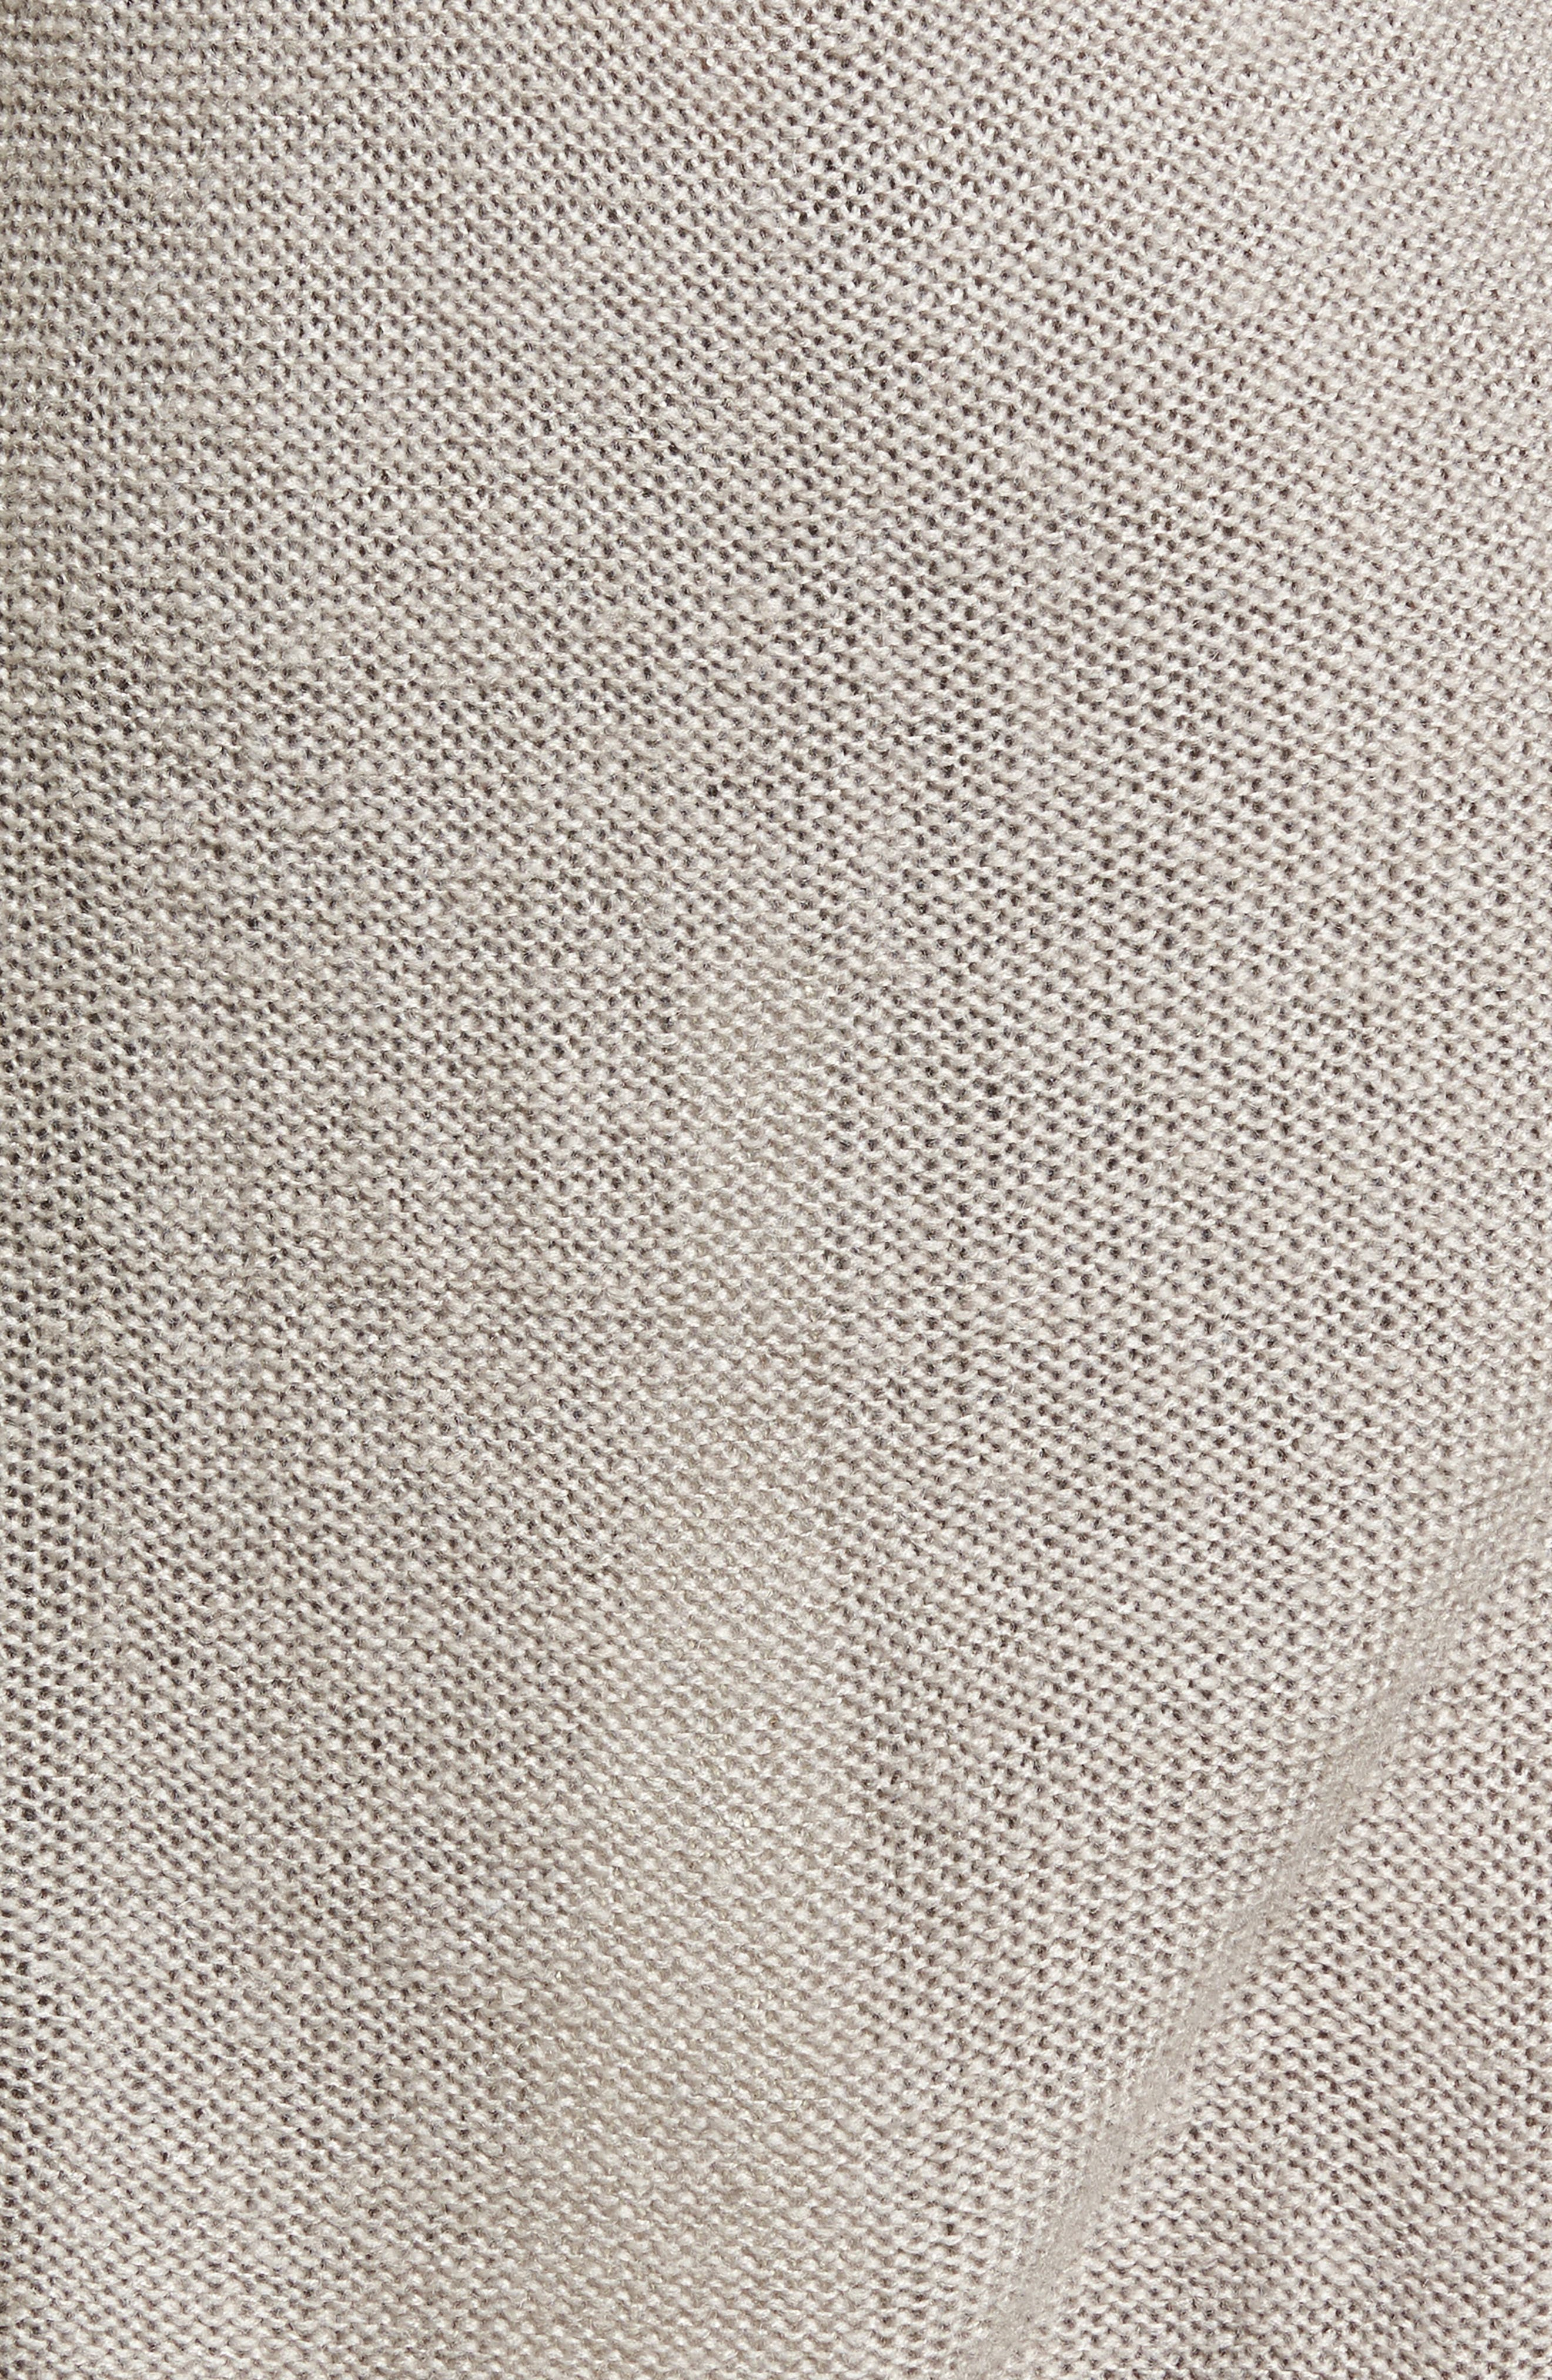 Bell Sleeve Sweater Dress,                             Alternate thumbnail 9, color,